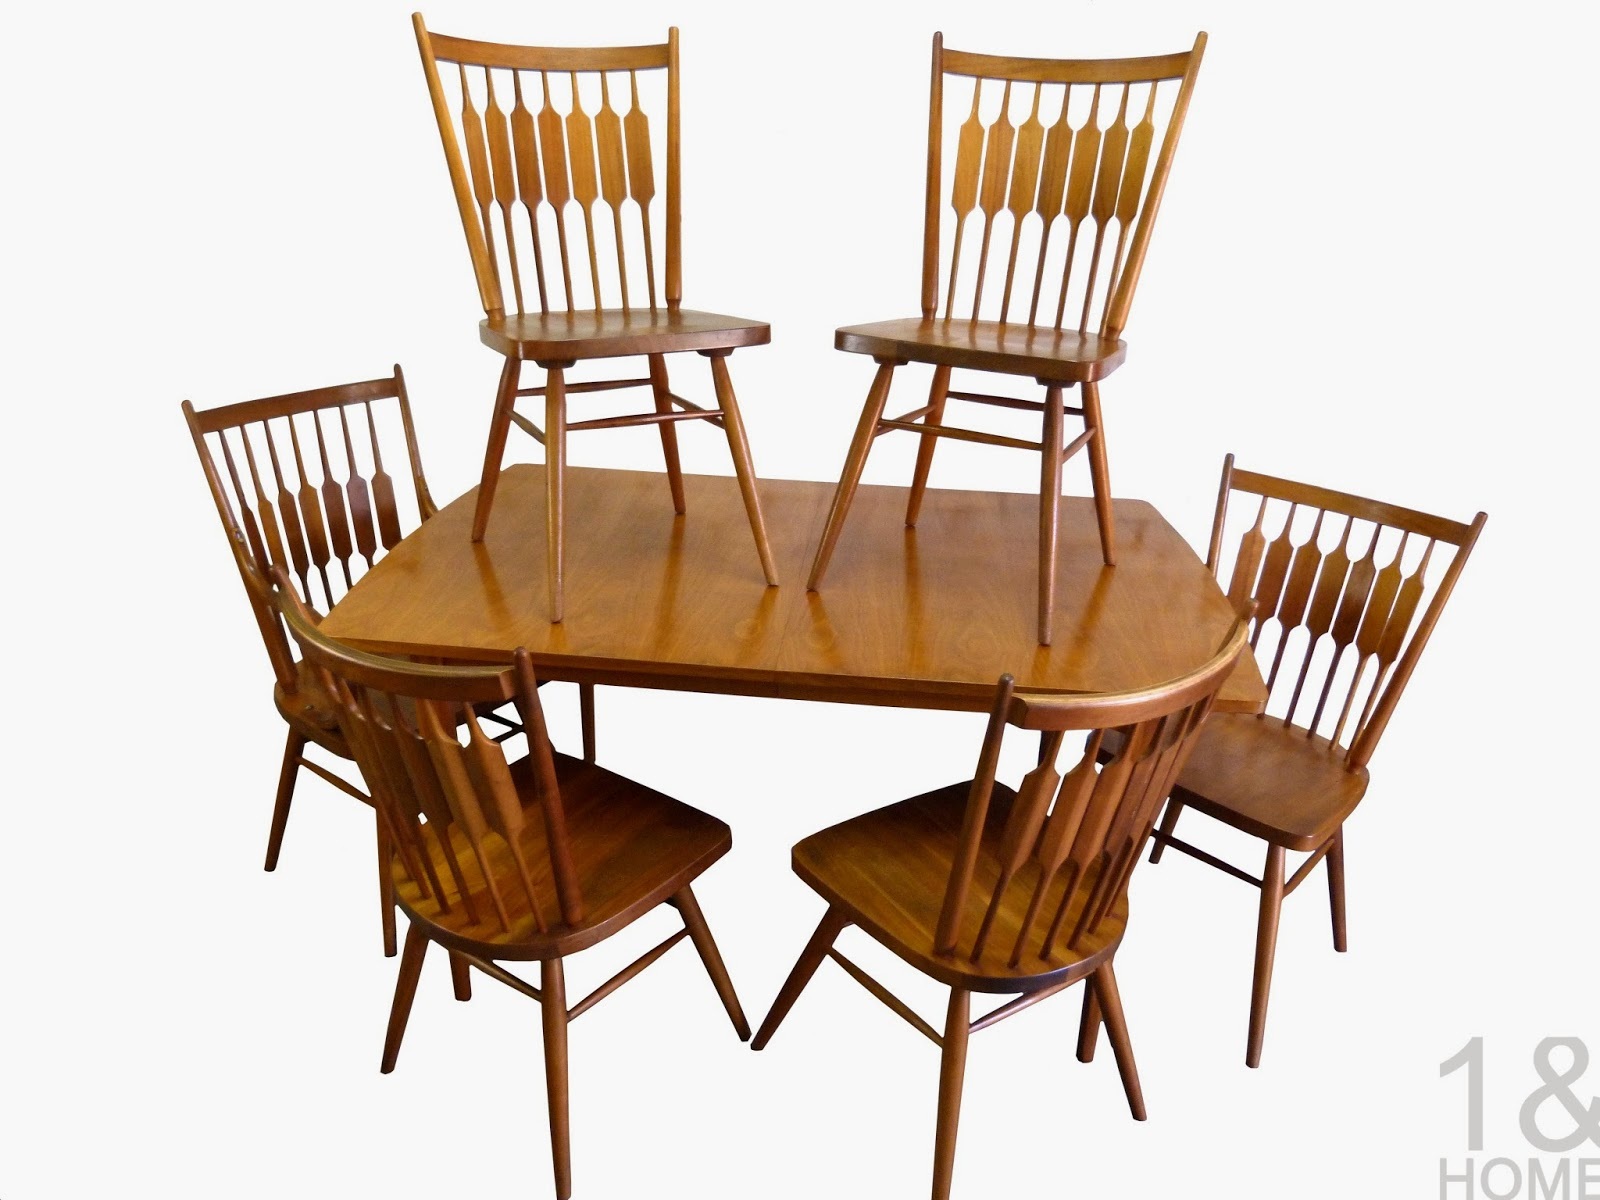 Drexel Declaration Centennial Stewart MacDougall Kipp Dining Room Table Chairs Mid Century Modern